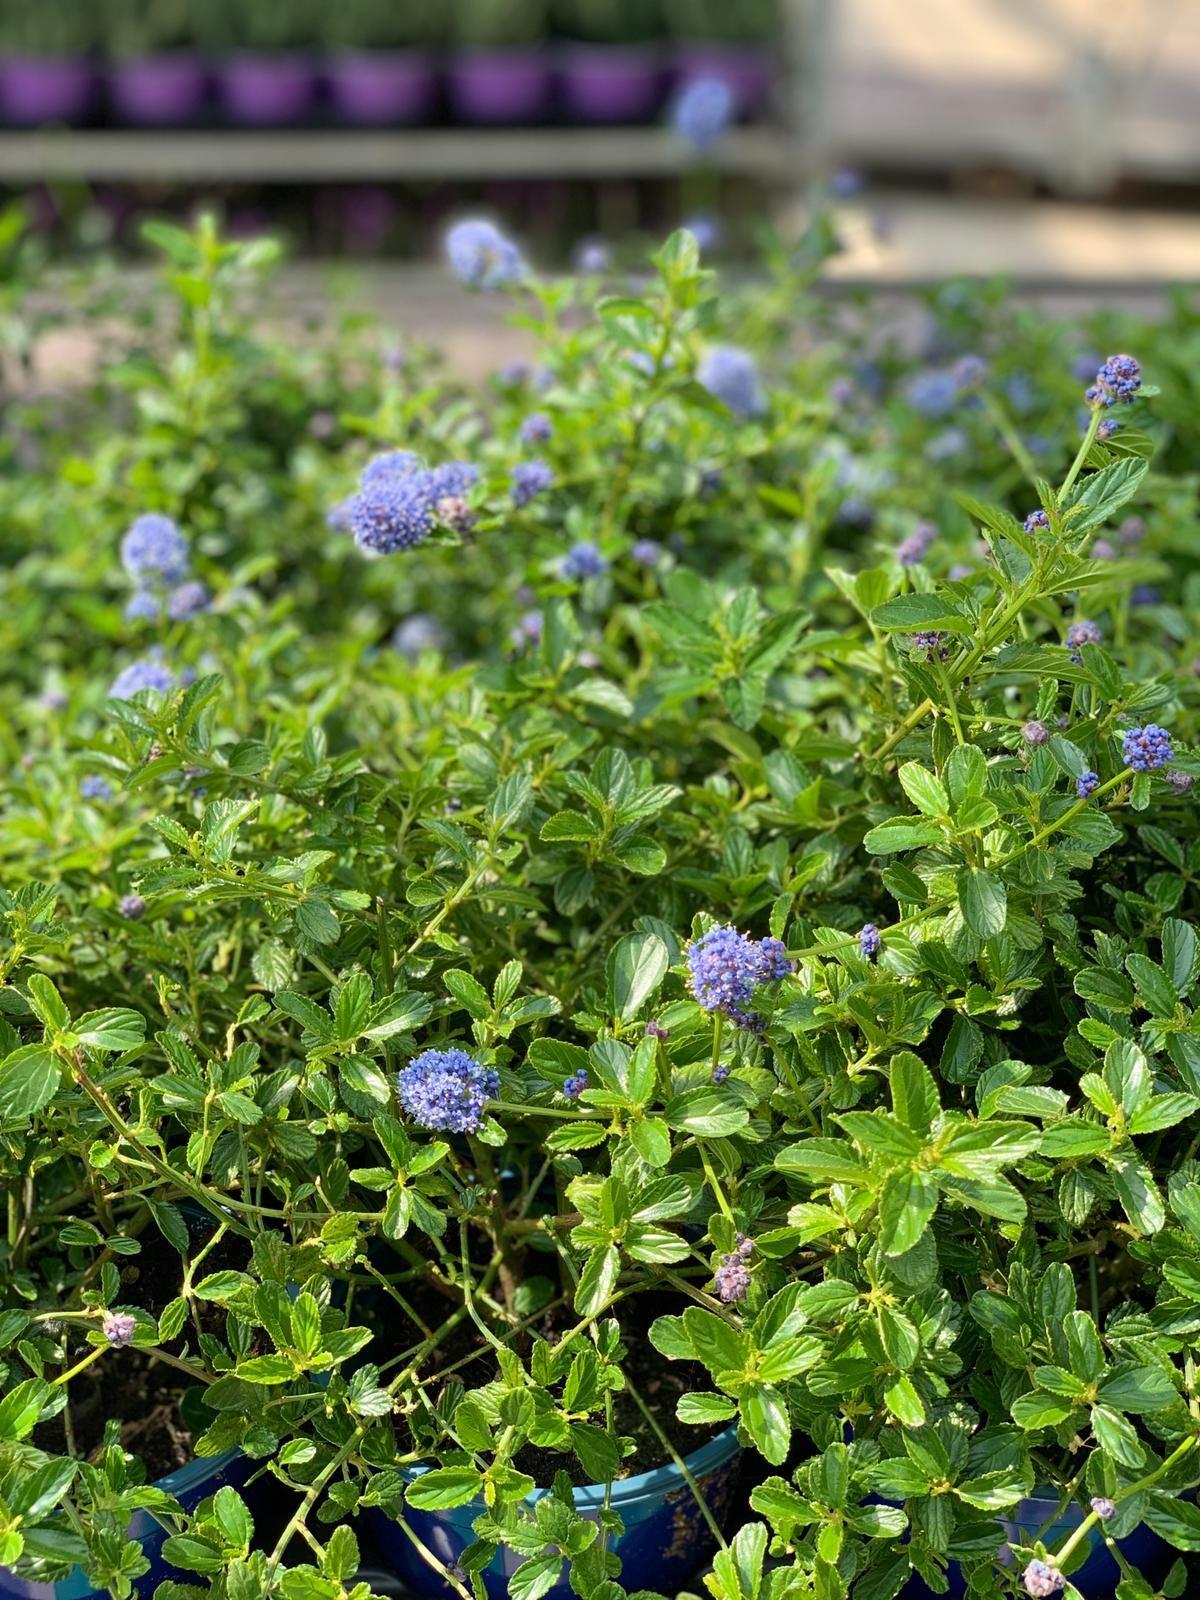 Il Ceanothus Thyrsiflorus Noto Come Blue Flower Ceanothus E Un